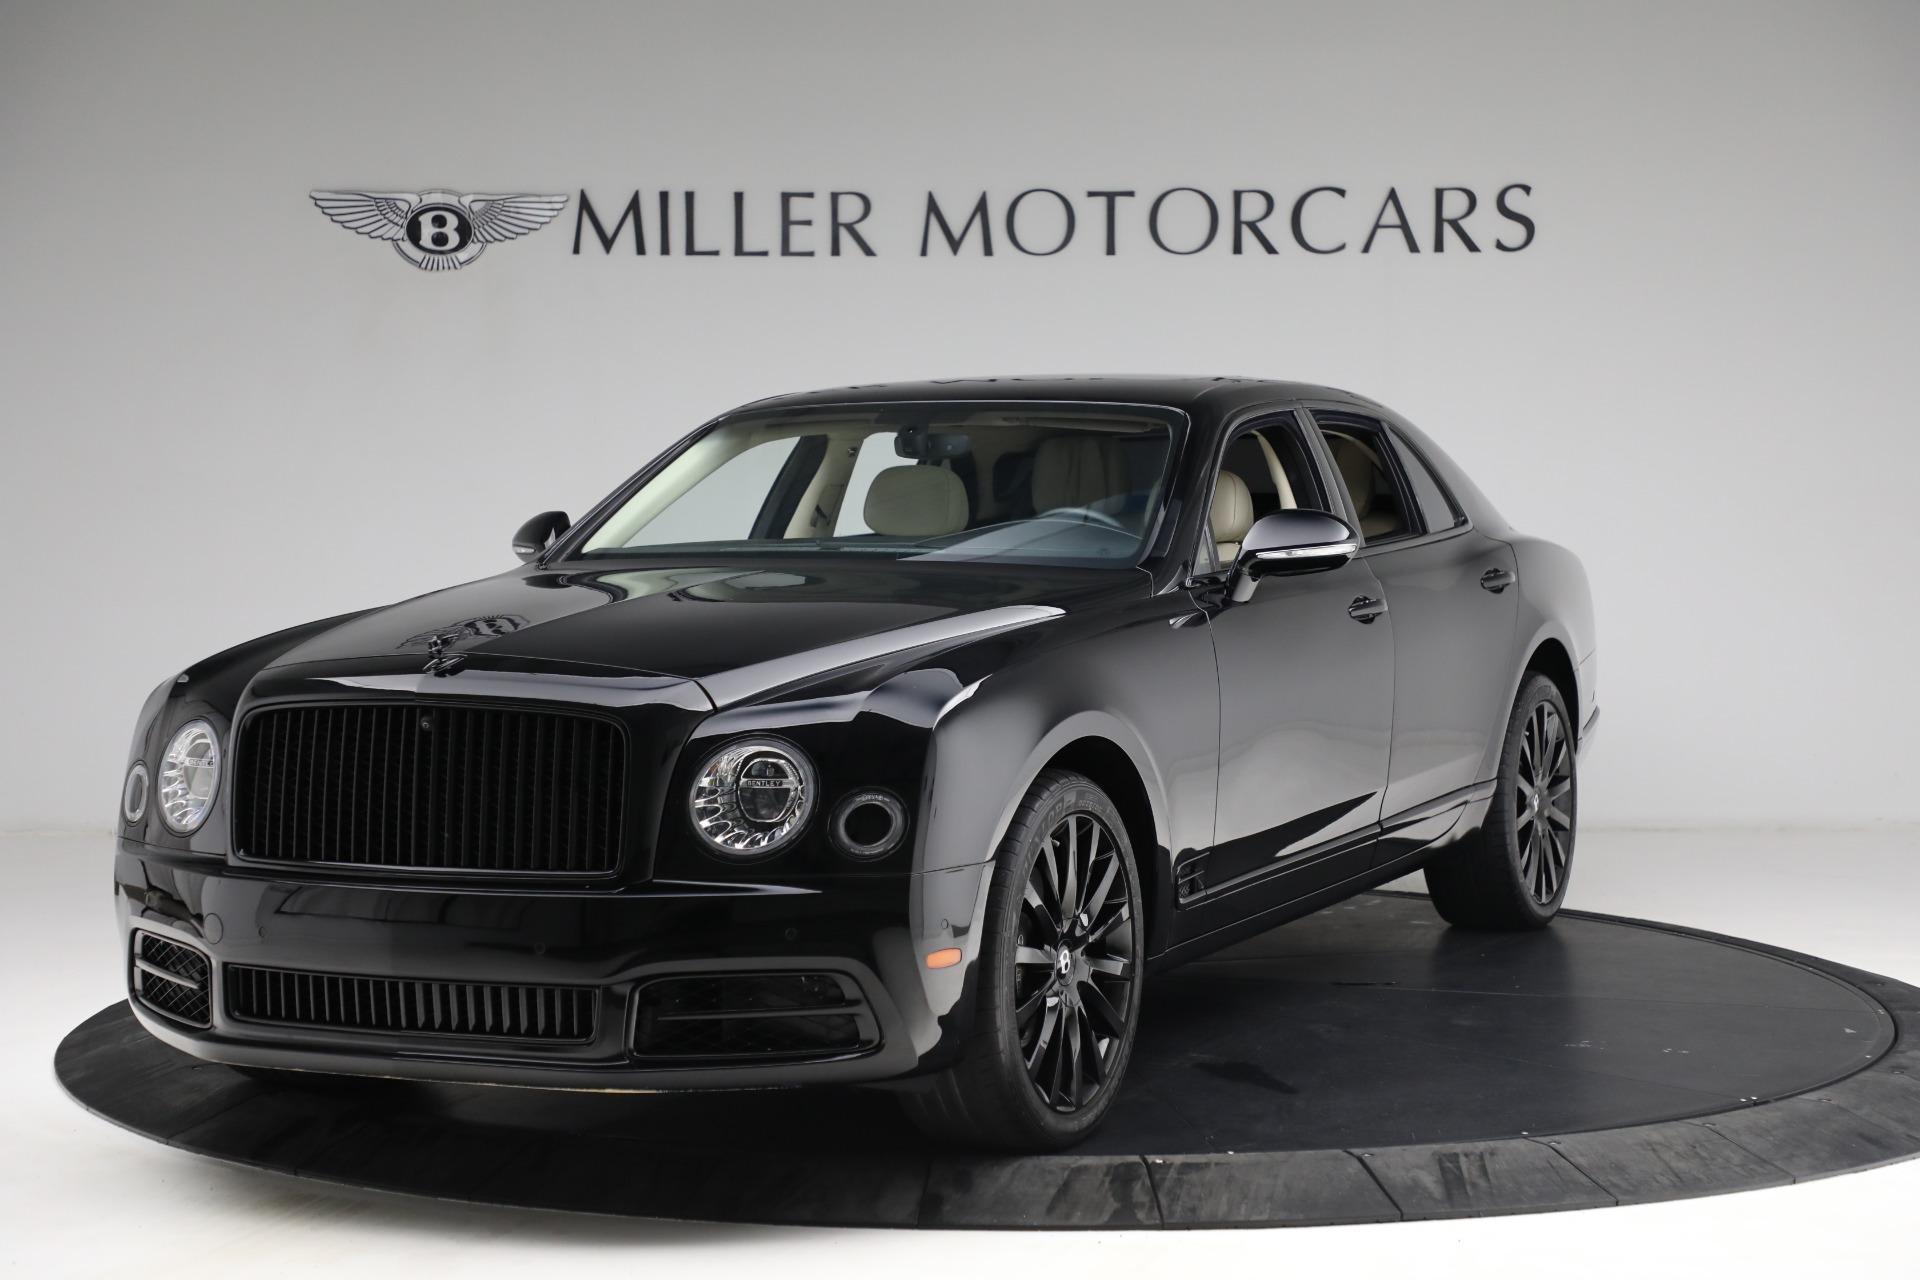 Used 2017 Bentley Mulsanne for sale $214,900 at Rolls-Royce Motor Cars Greenwich in Greenwich CT 06830 1